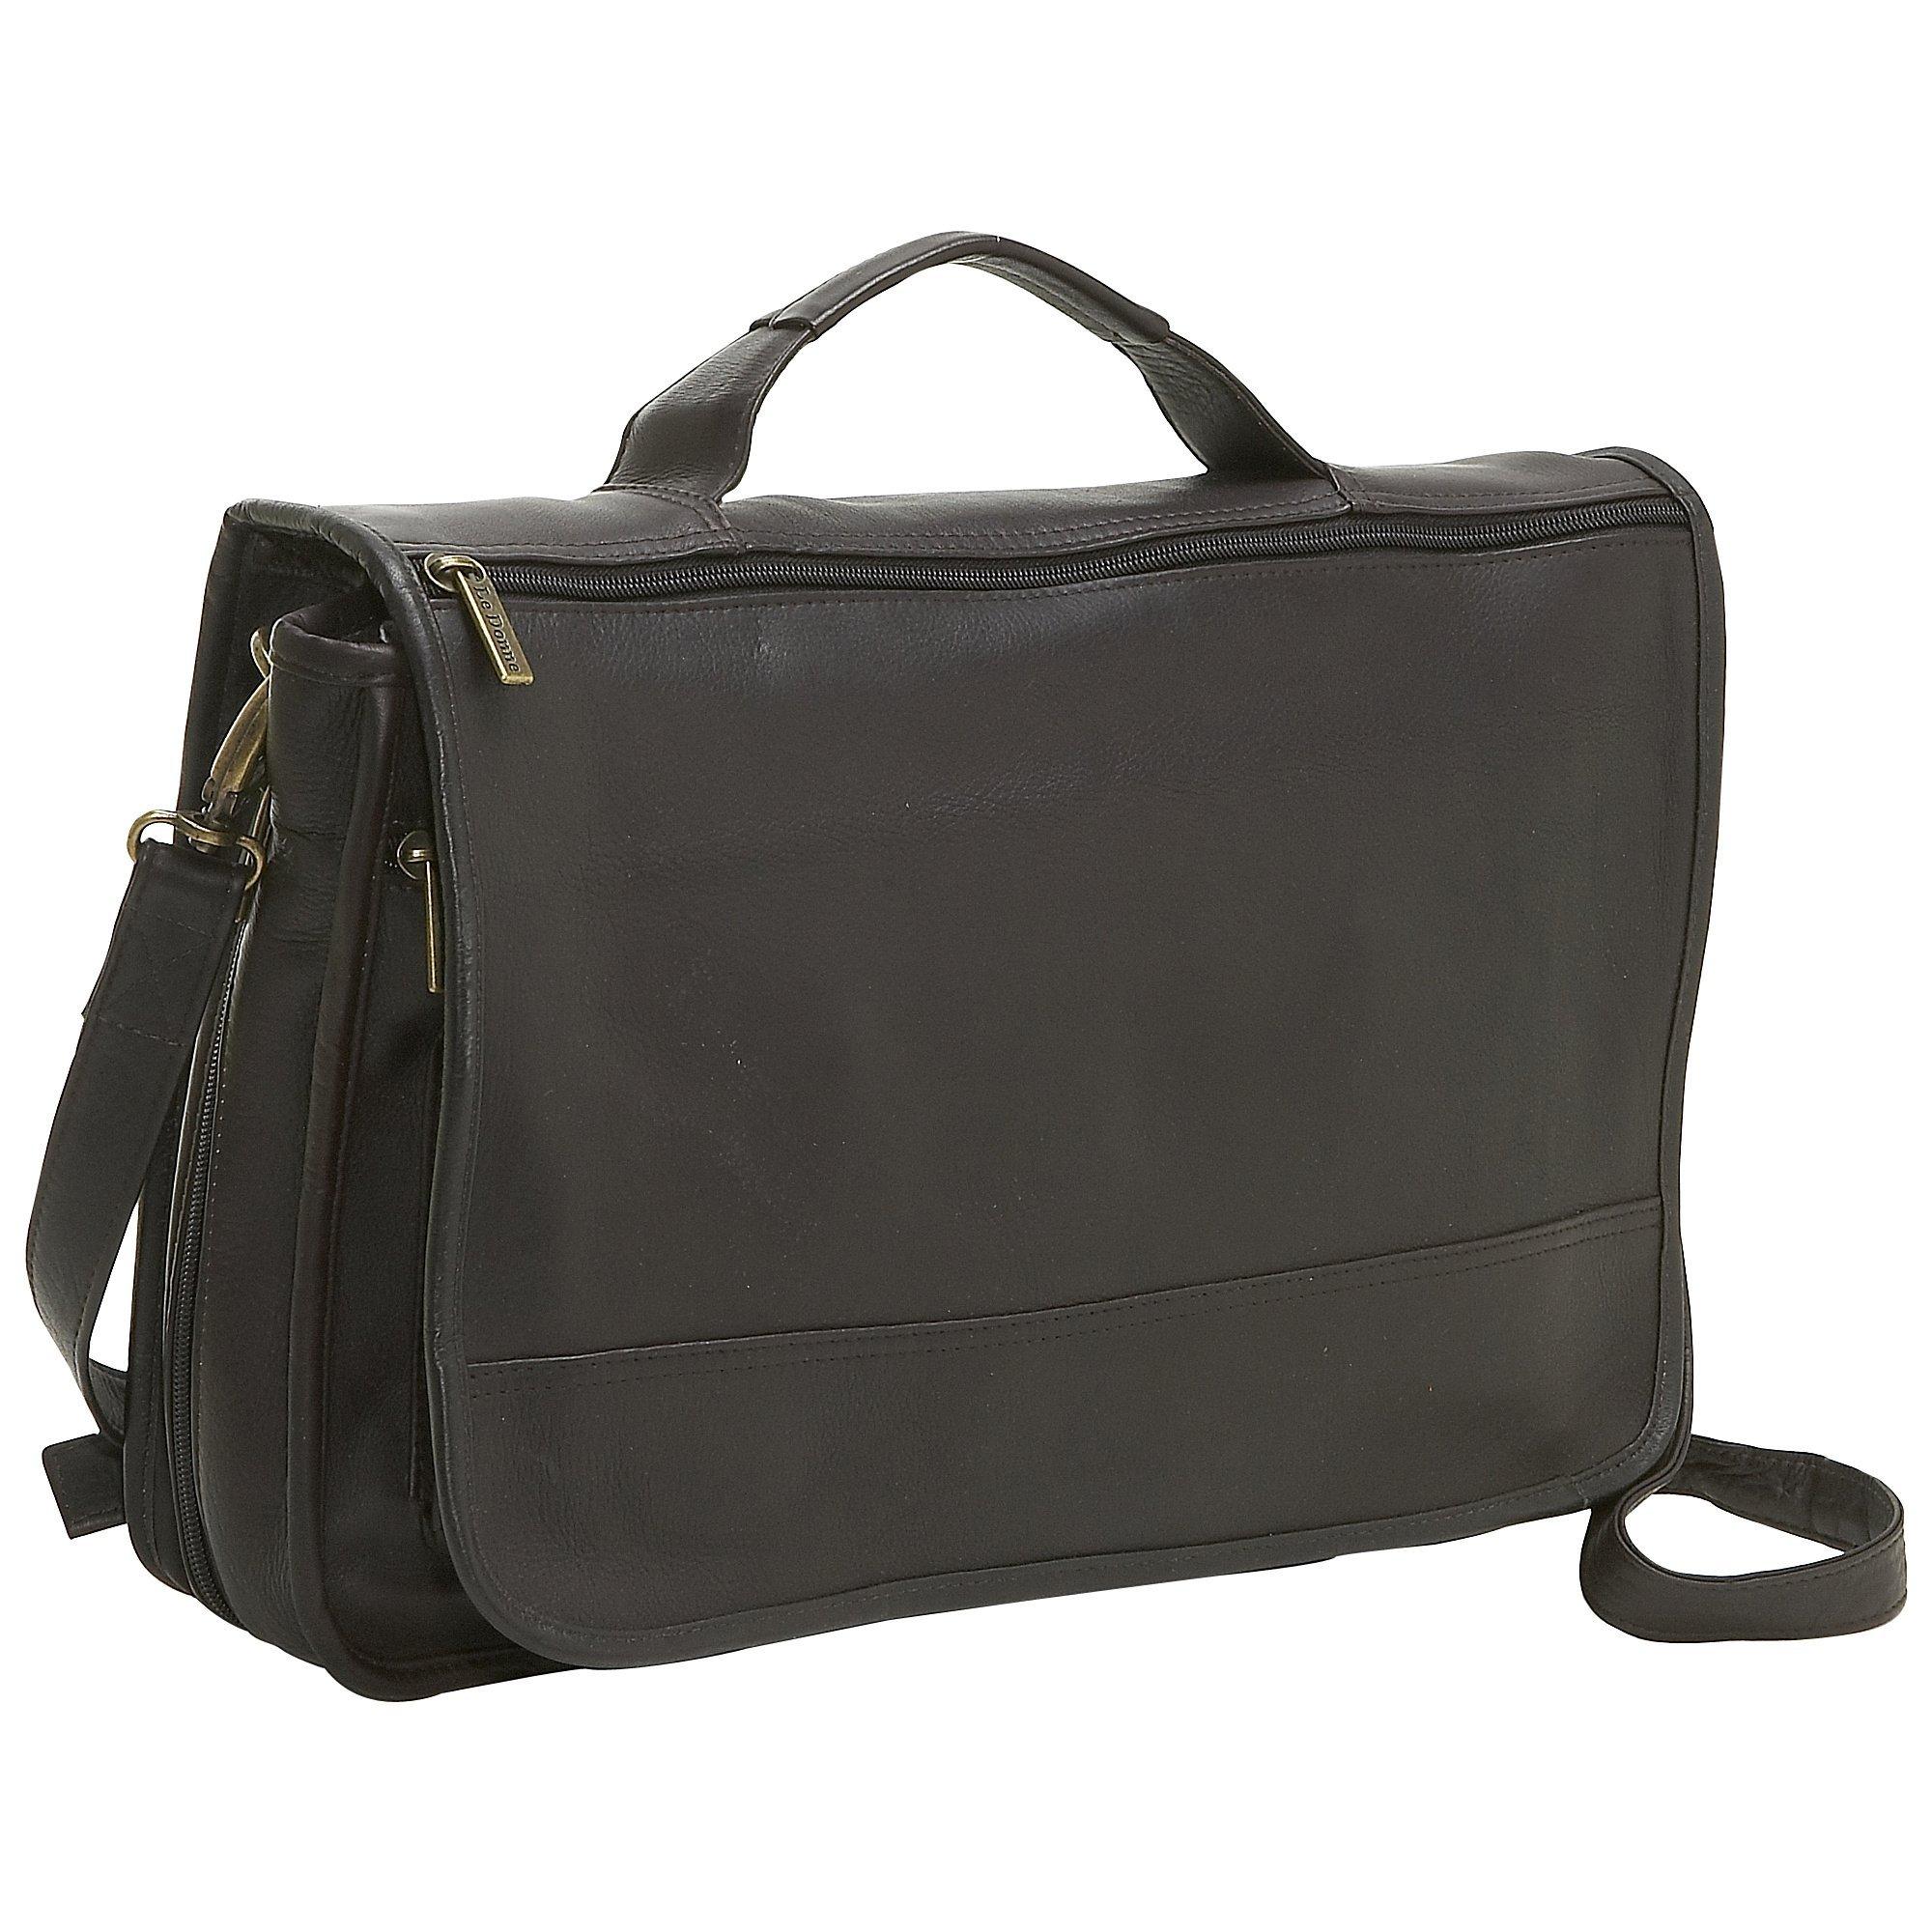 Le Donne Leather Expandable Messenger Bag, Cafe by Le Donne Leather